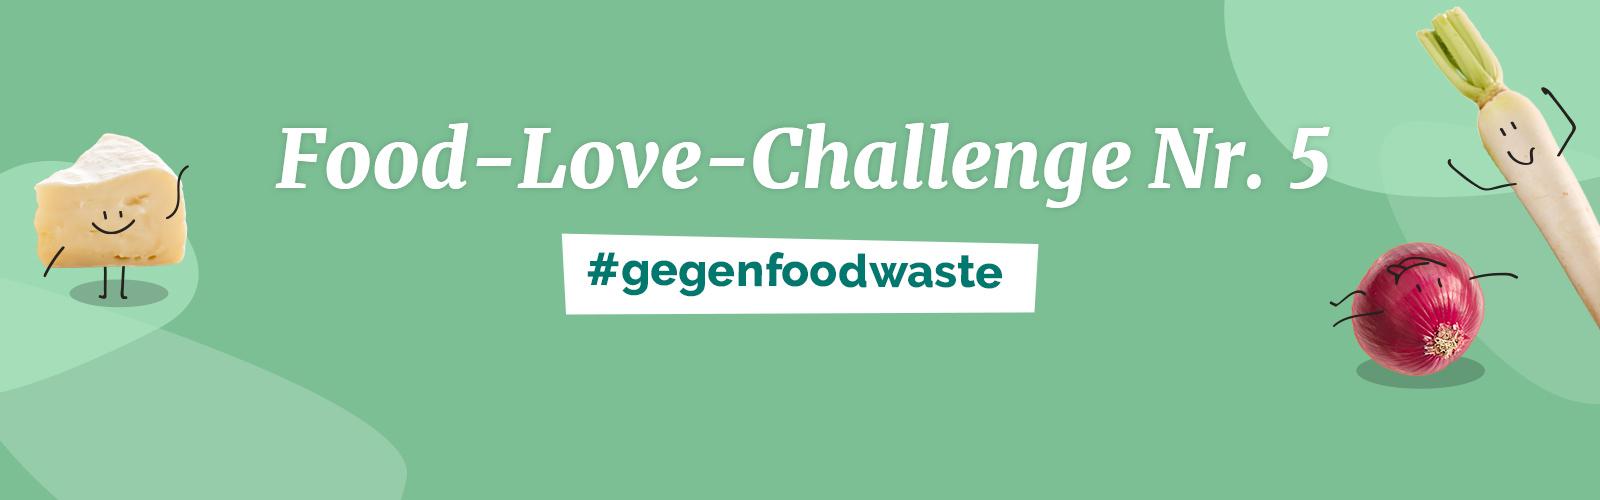 Food Love Challenge Nr. 5